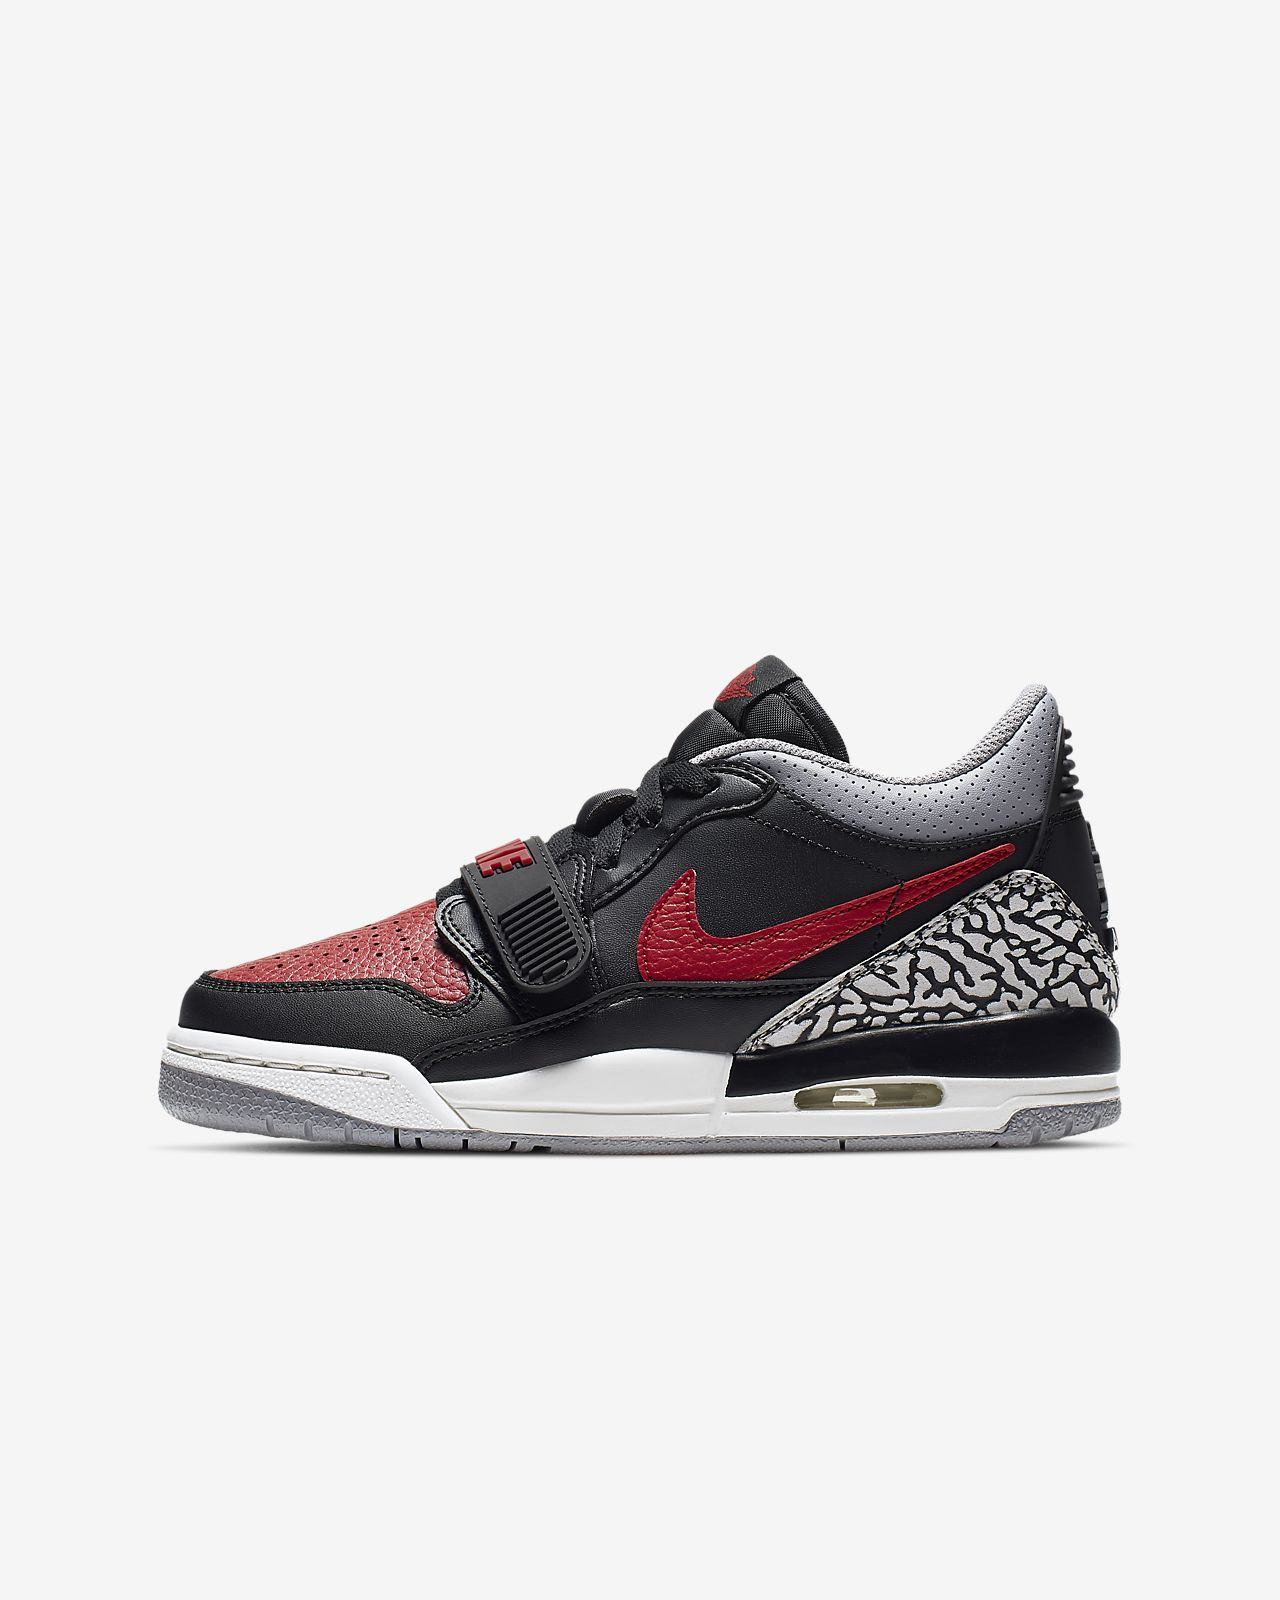 new style 885cf 8fe1a ... Air Jordan Legacy 312 Low Schuh für ältere Kinder